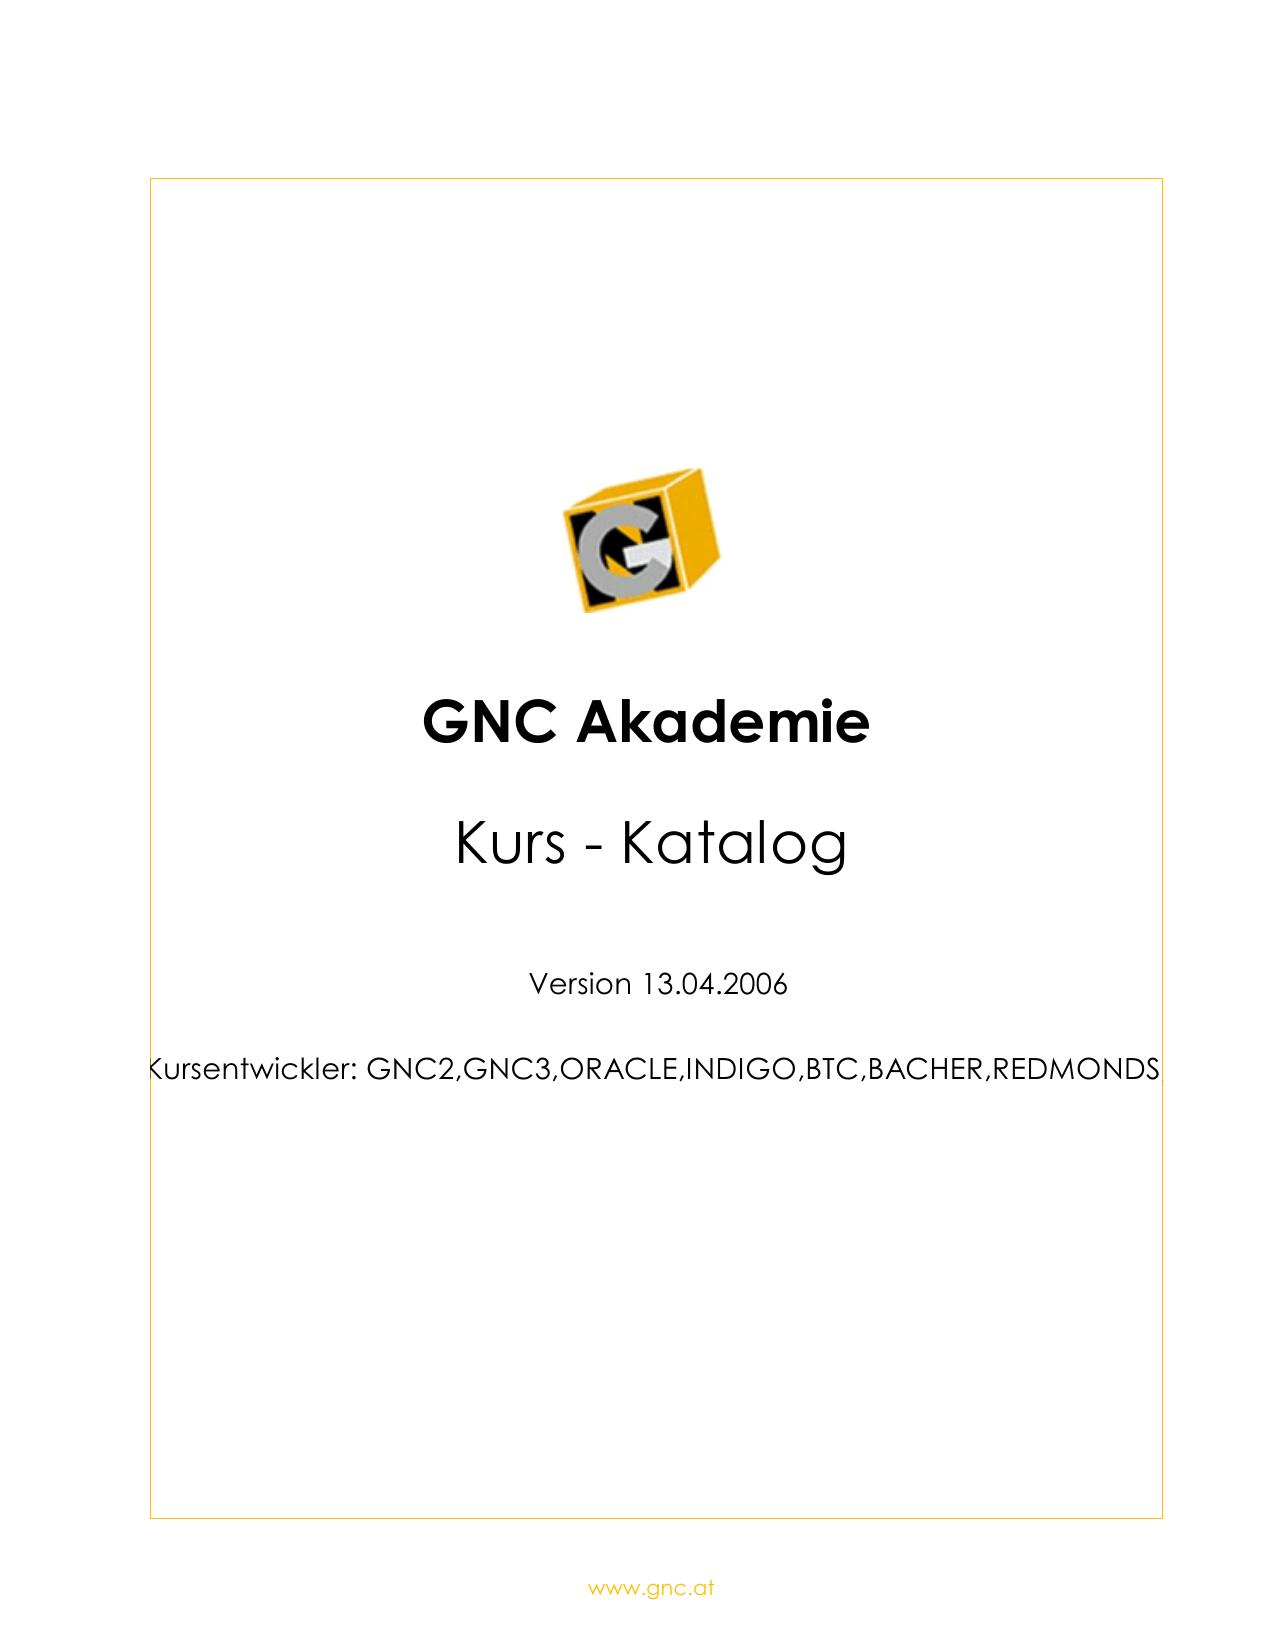 GNC Akademie Kurs - Katalog